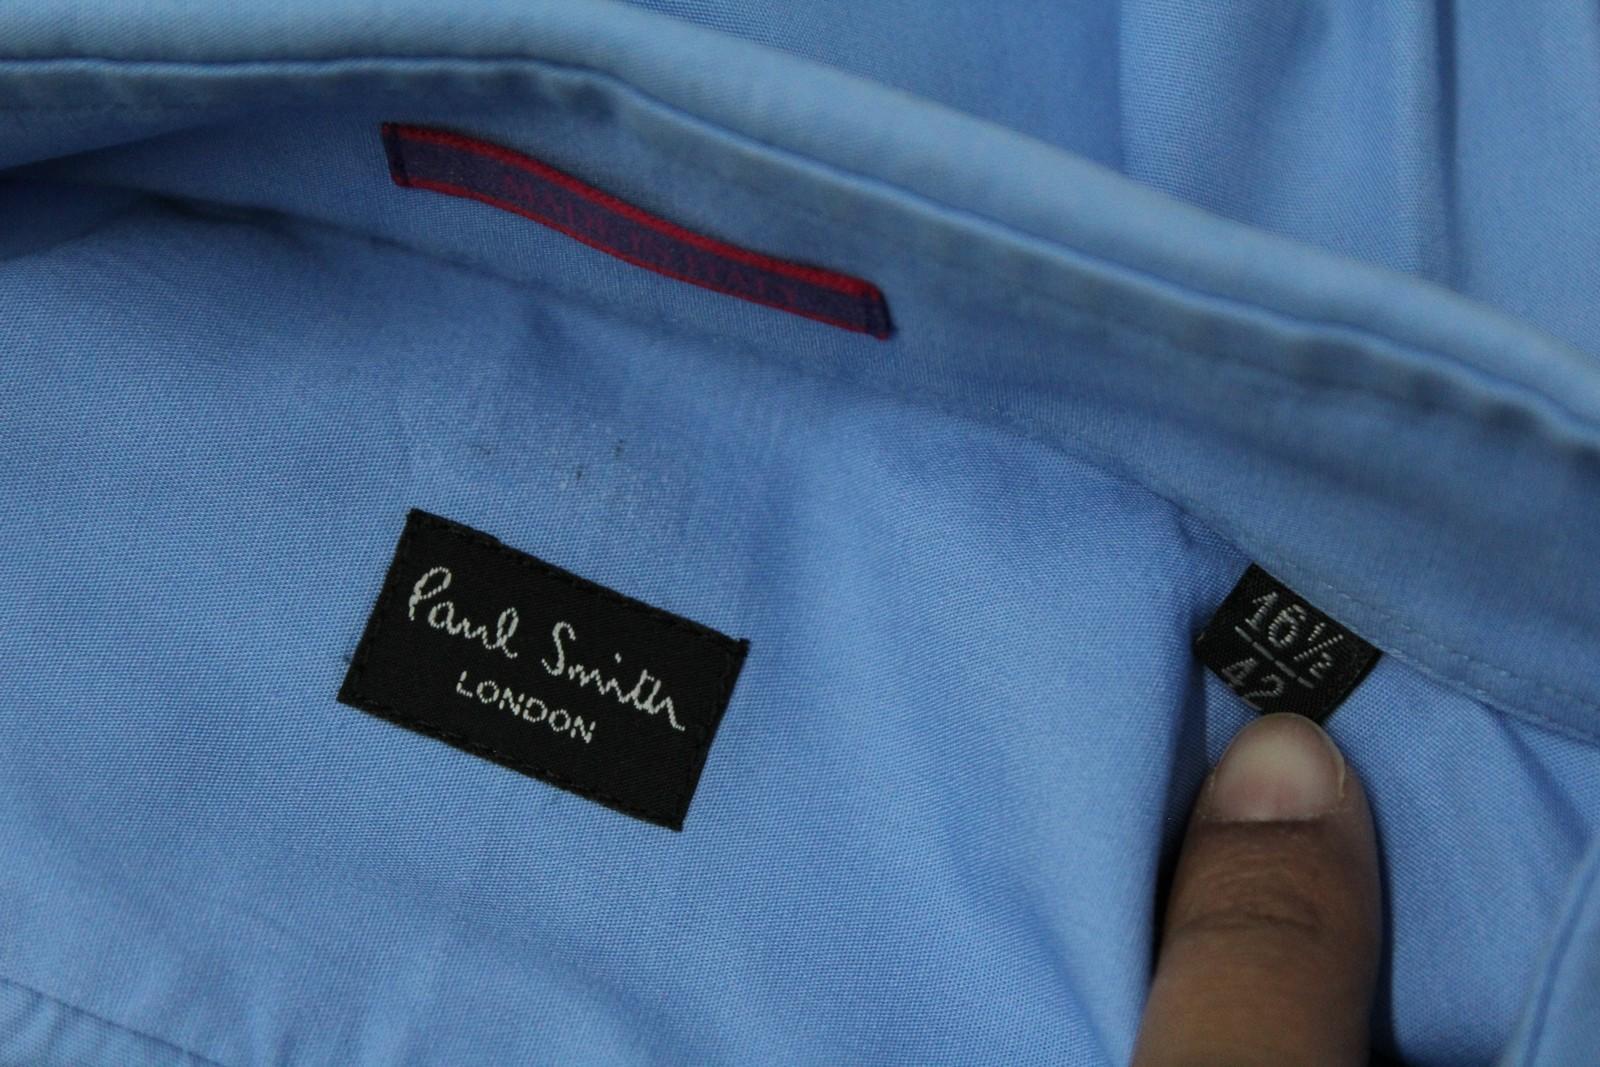 Paul-Smith-Hombres-Azul-Algodon-Mangas-Largas-Camisa-De-Puno-Doble-Cuello-16-5-034-42cm miniatura 10